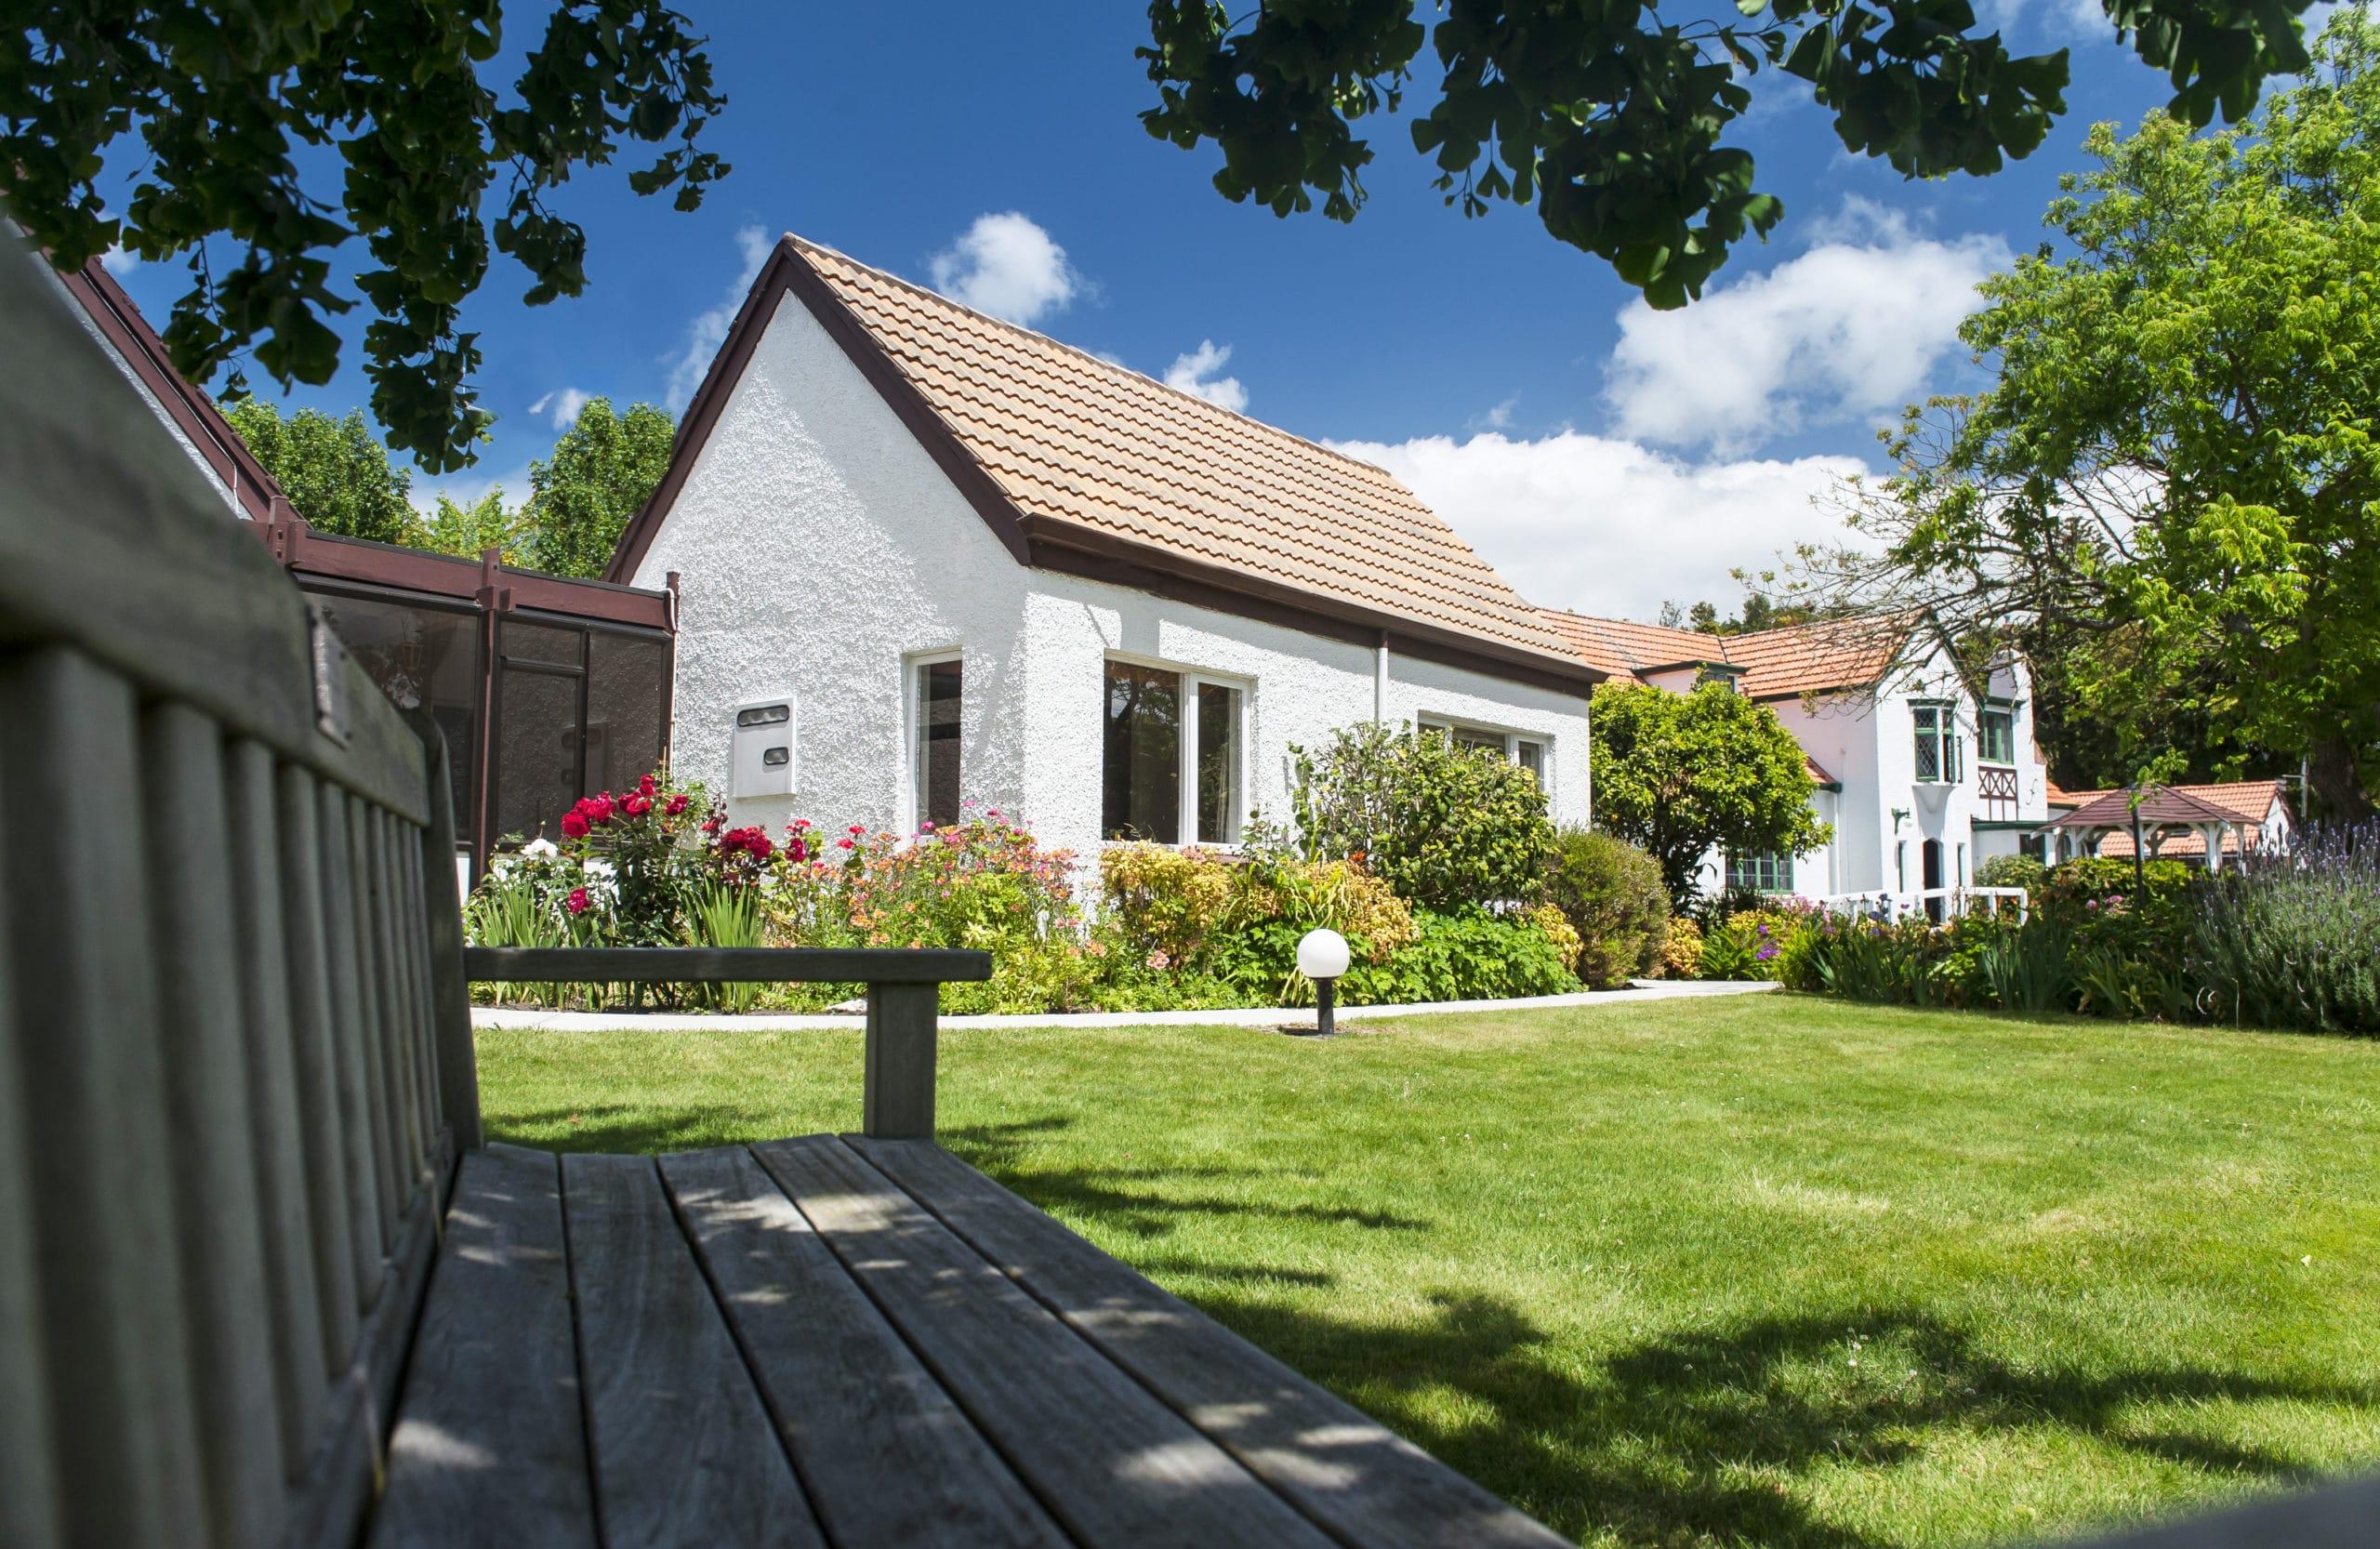 Abingdon Retirement Village